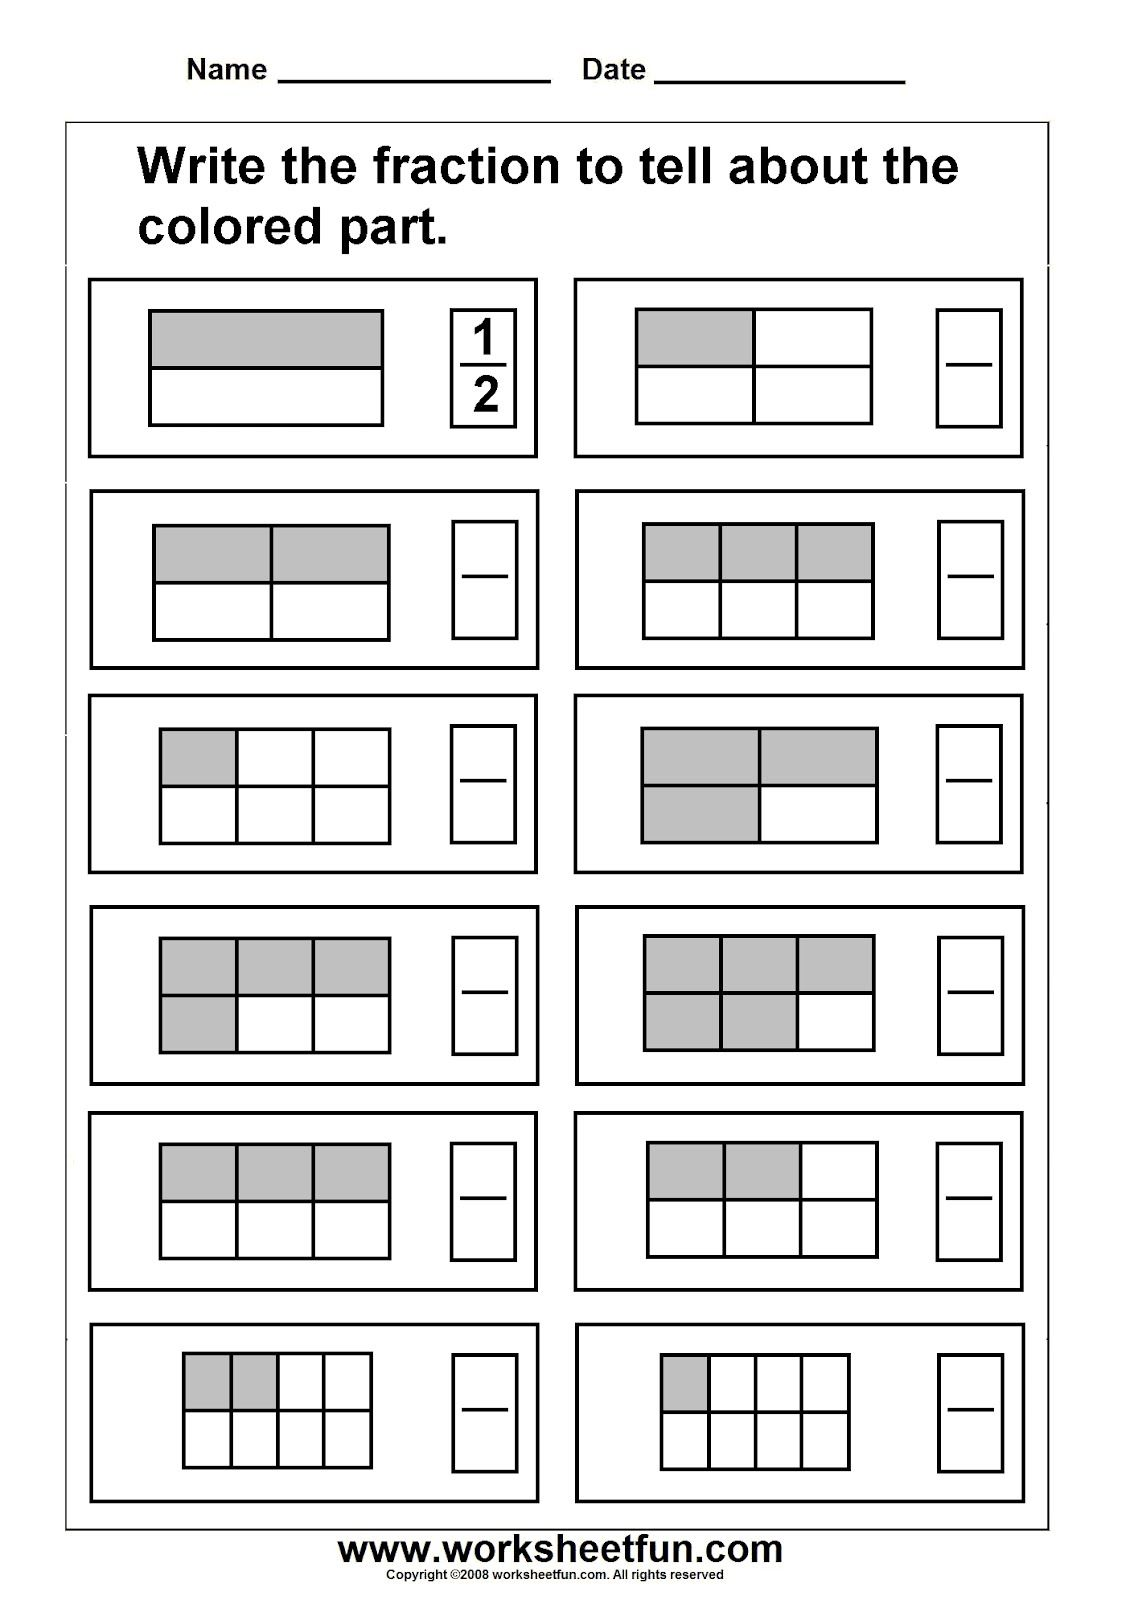 Worksheetfun Free Printable Worksheets Fractions Worksheets 3rd Grade Math Worksheets Learning Math